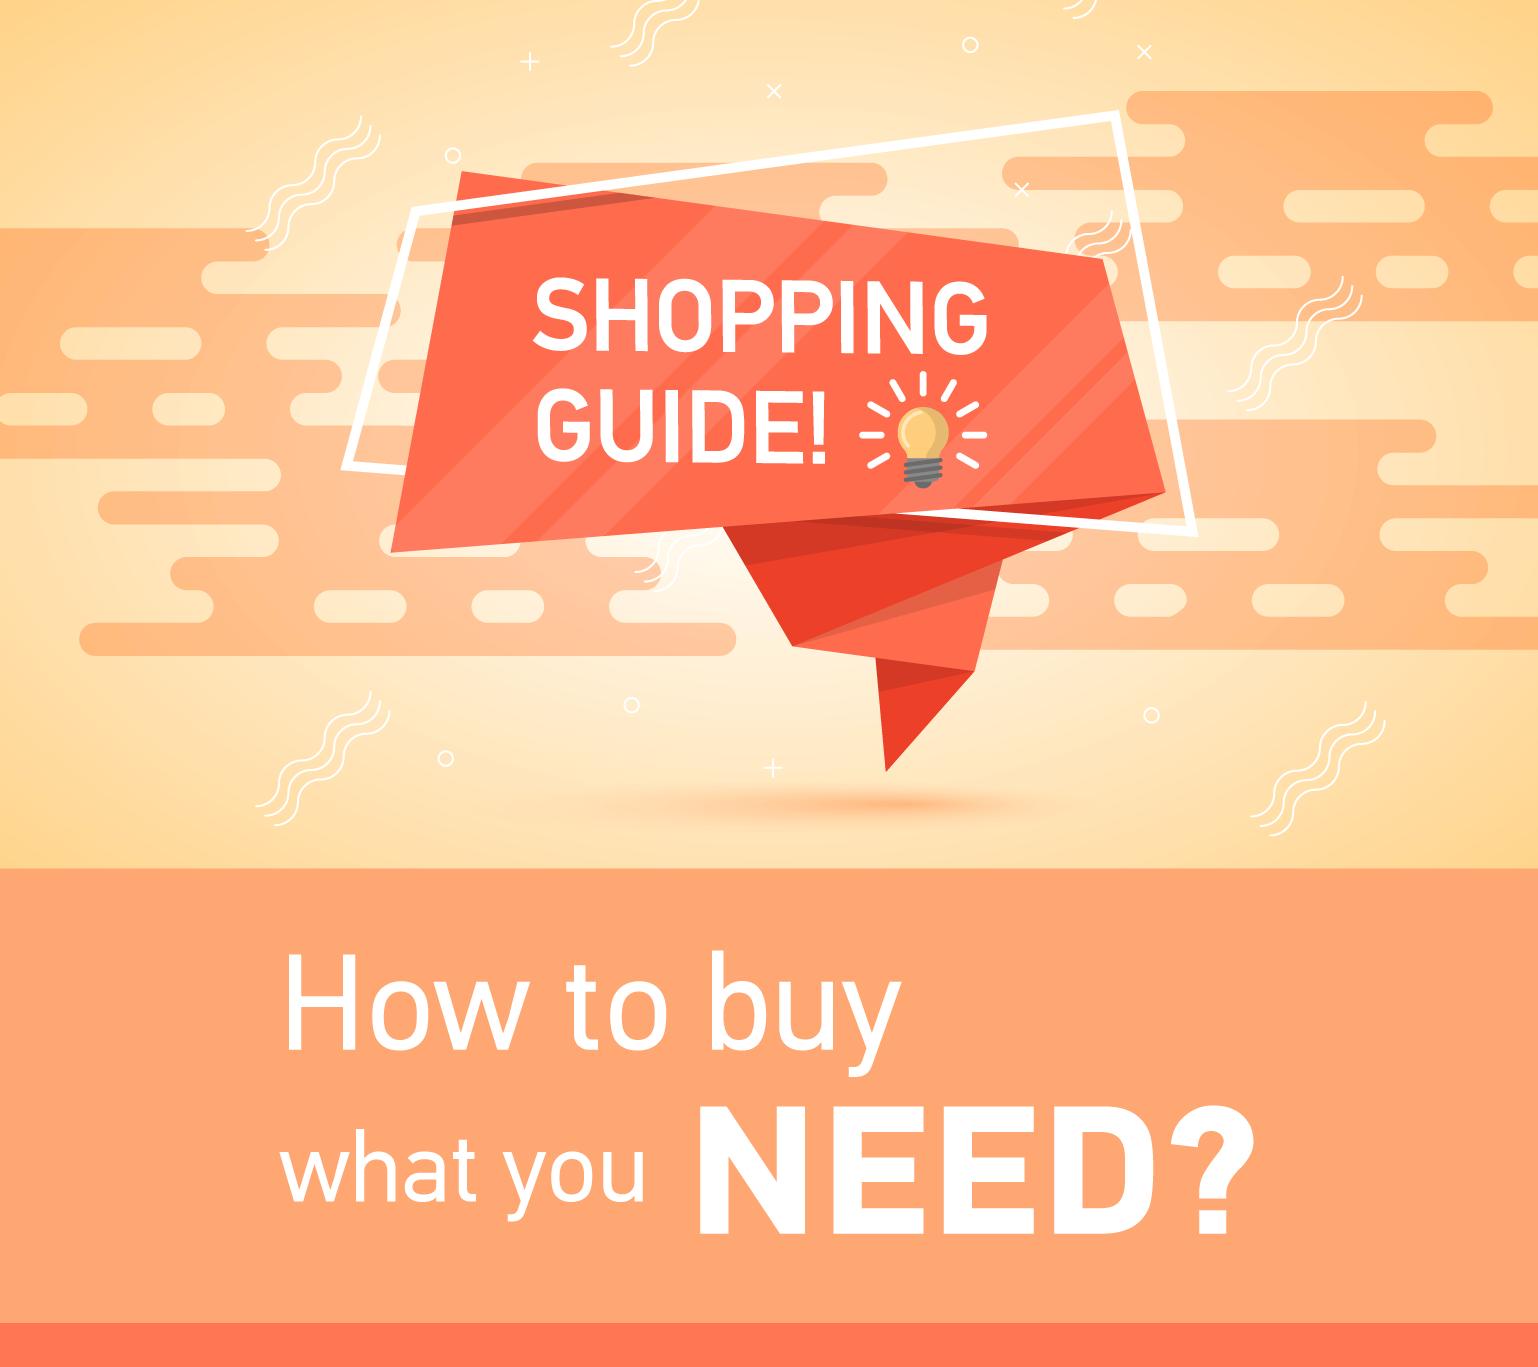 ShoppingGuide-CatHeroMob_en.png